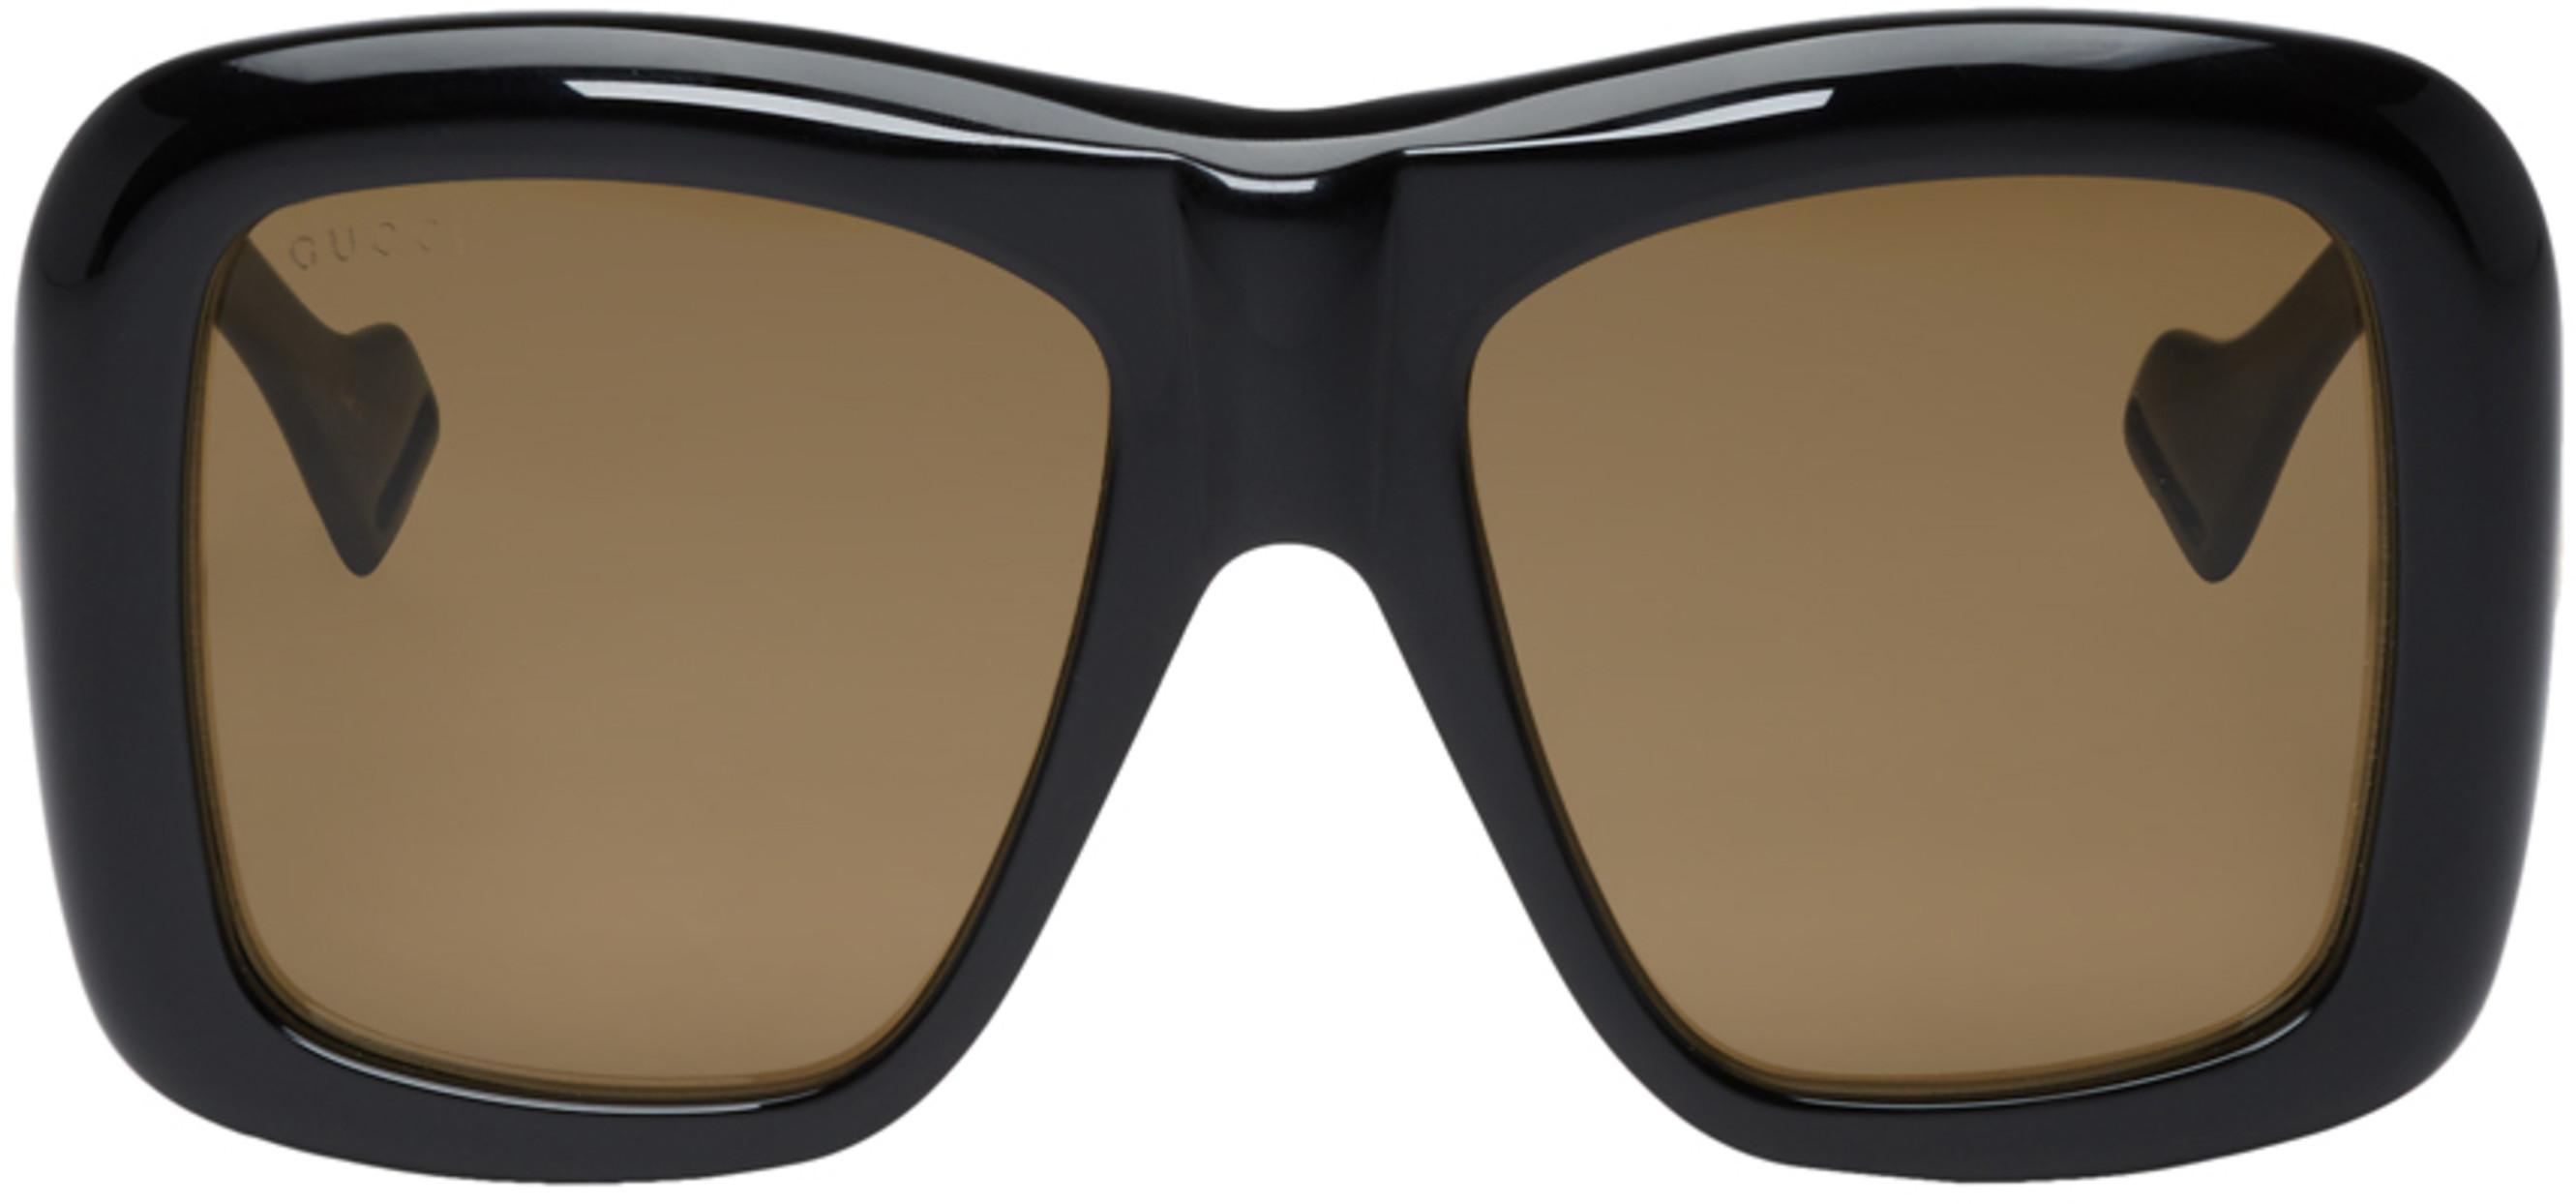 46e8e13f0cc64 Designer sunglasses for Women